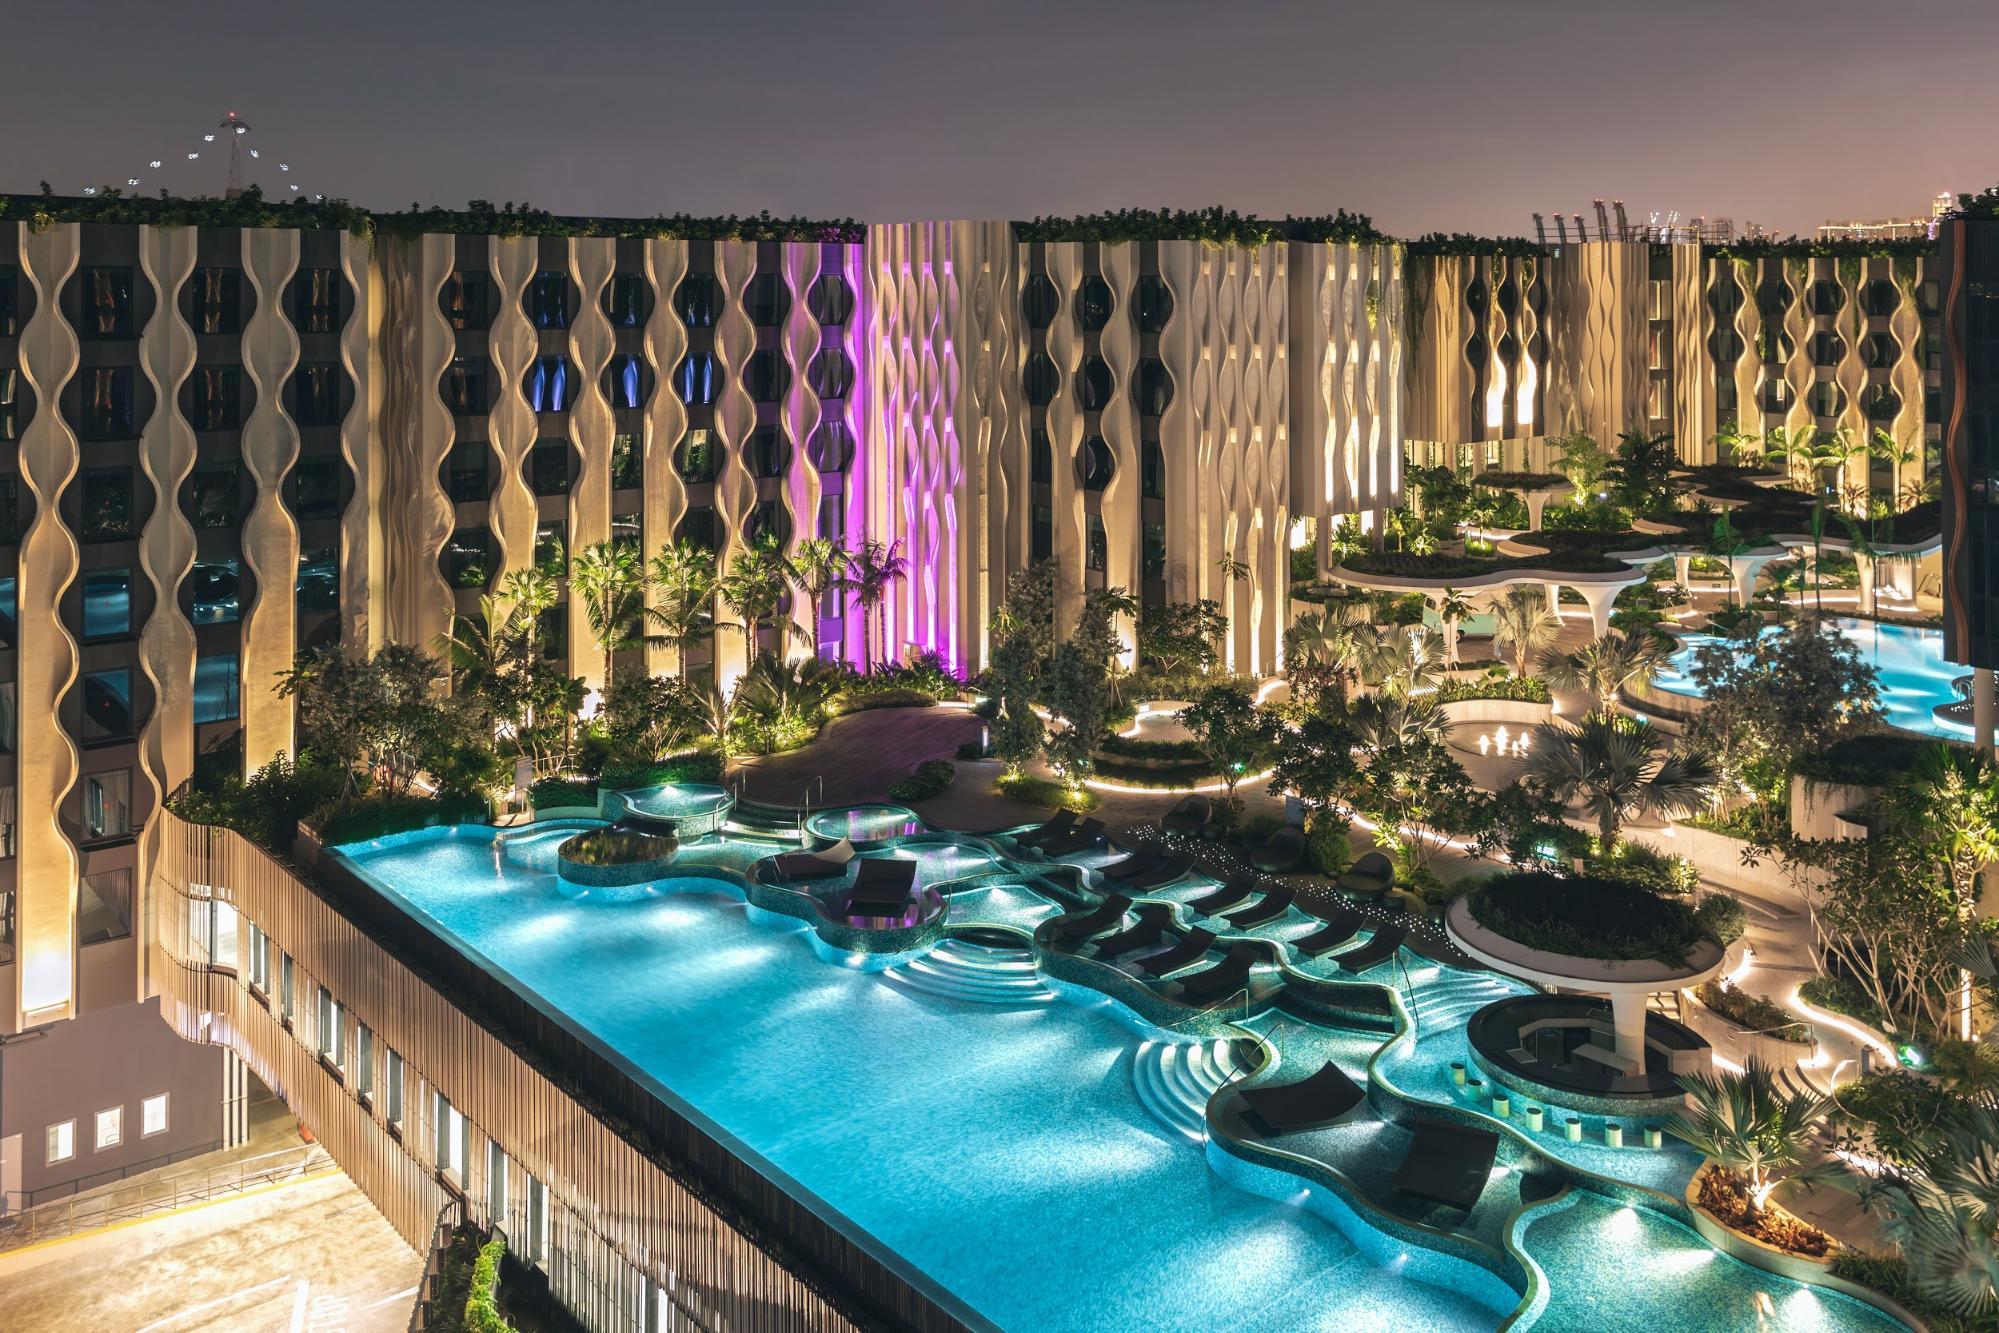 Sentosa Hotels Singapore Staycation Village